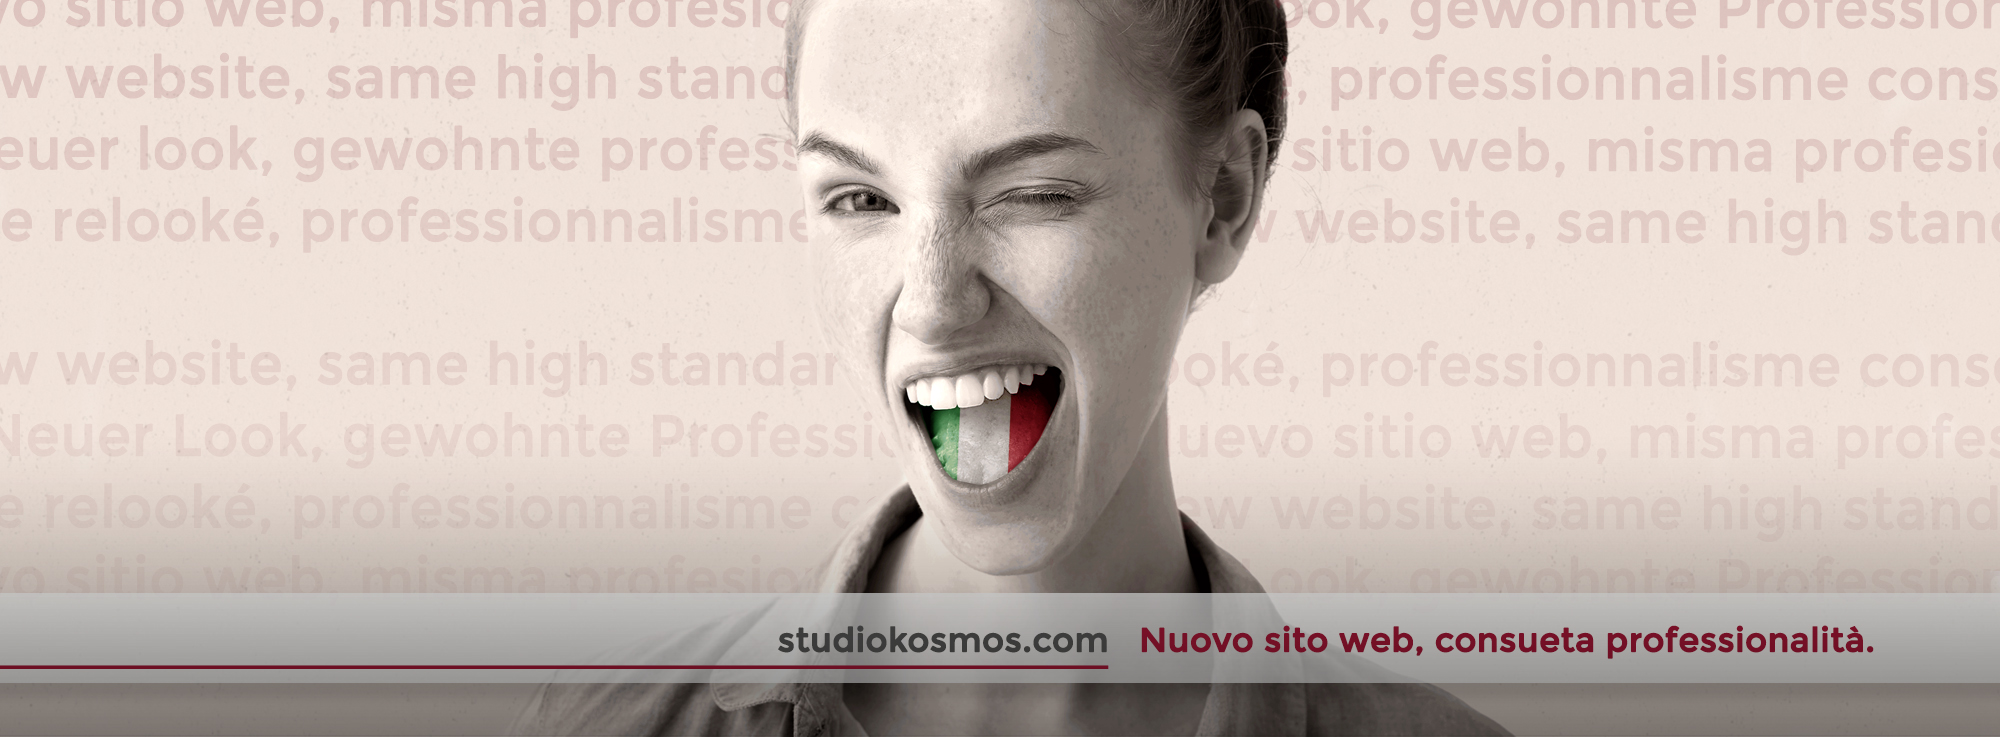 Kosmos Reggio Emilia